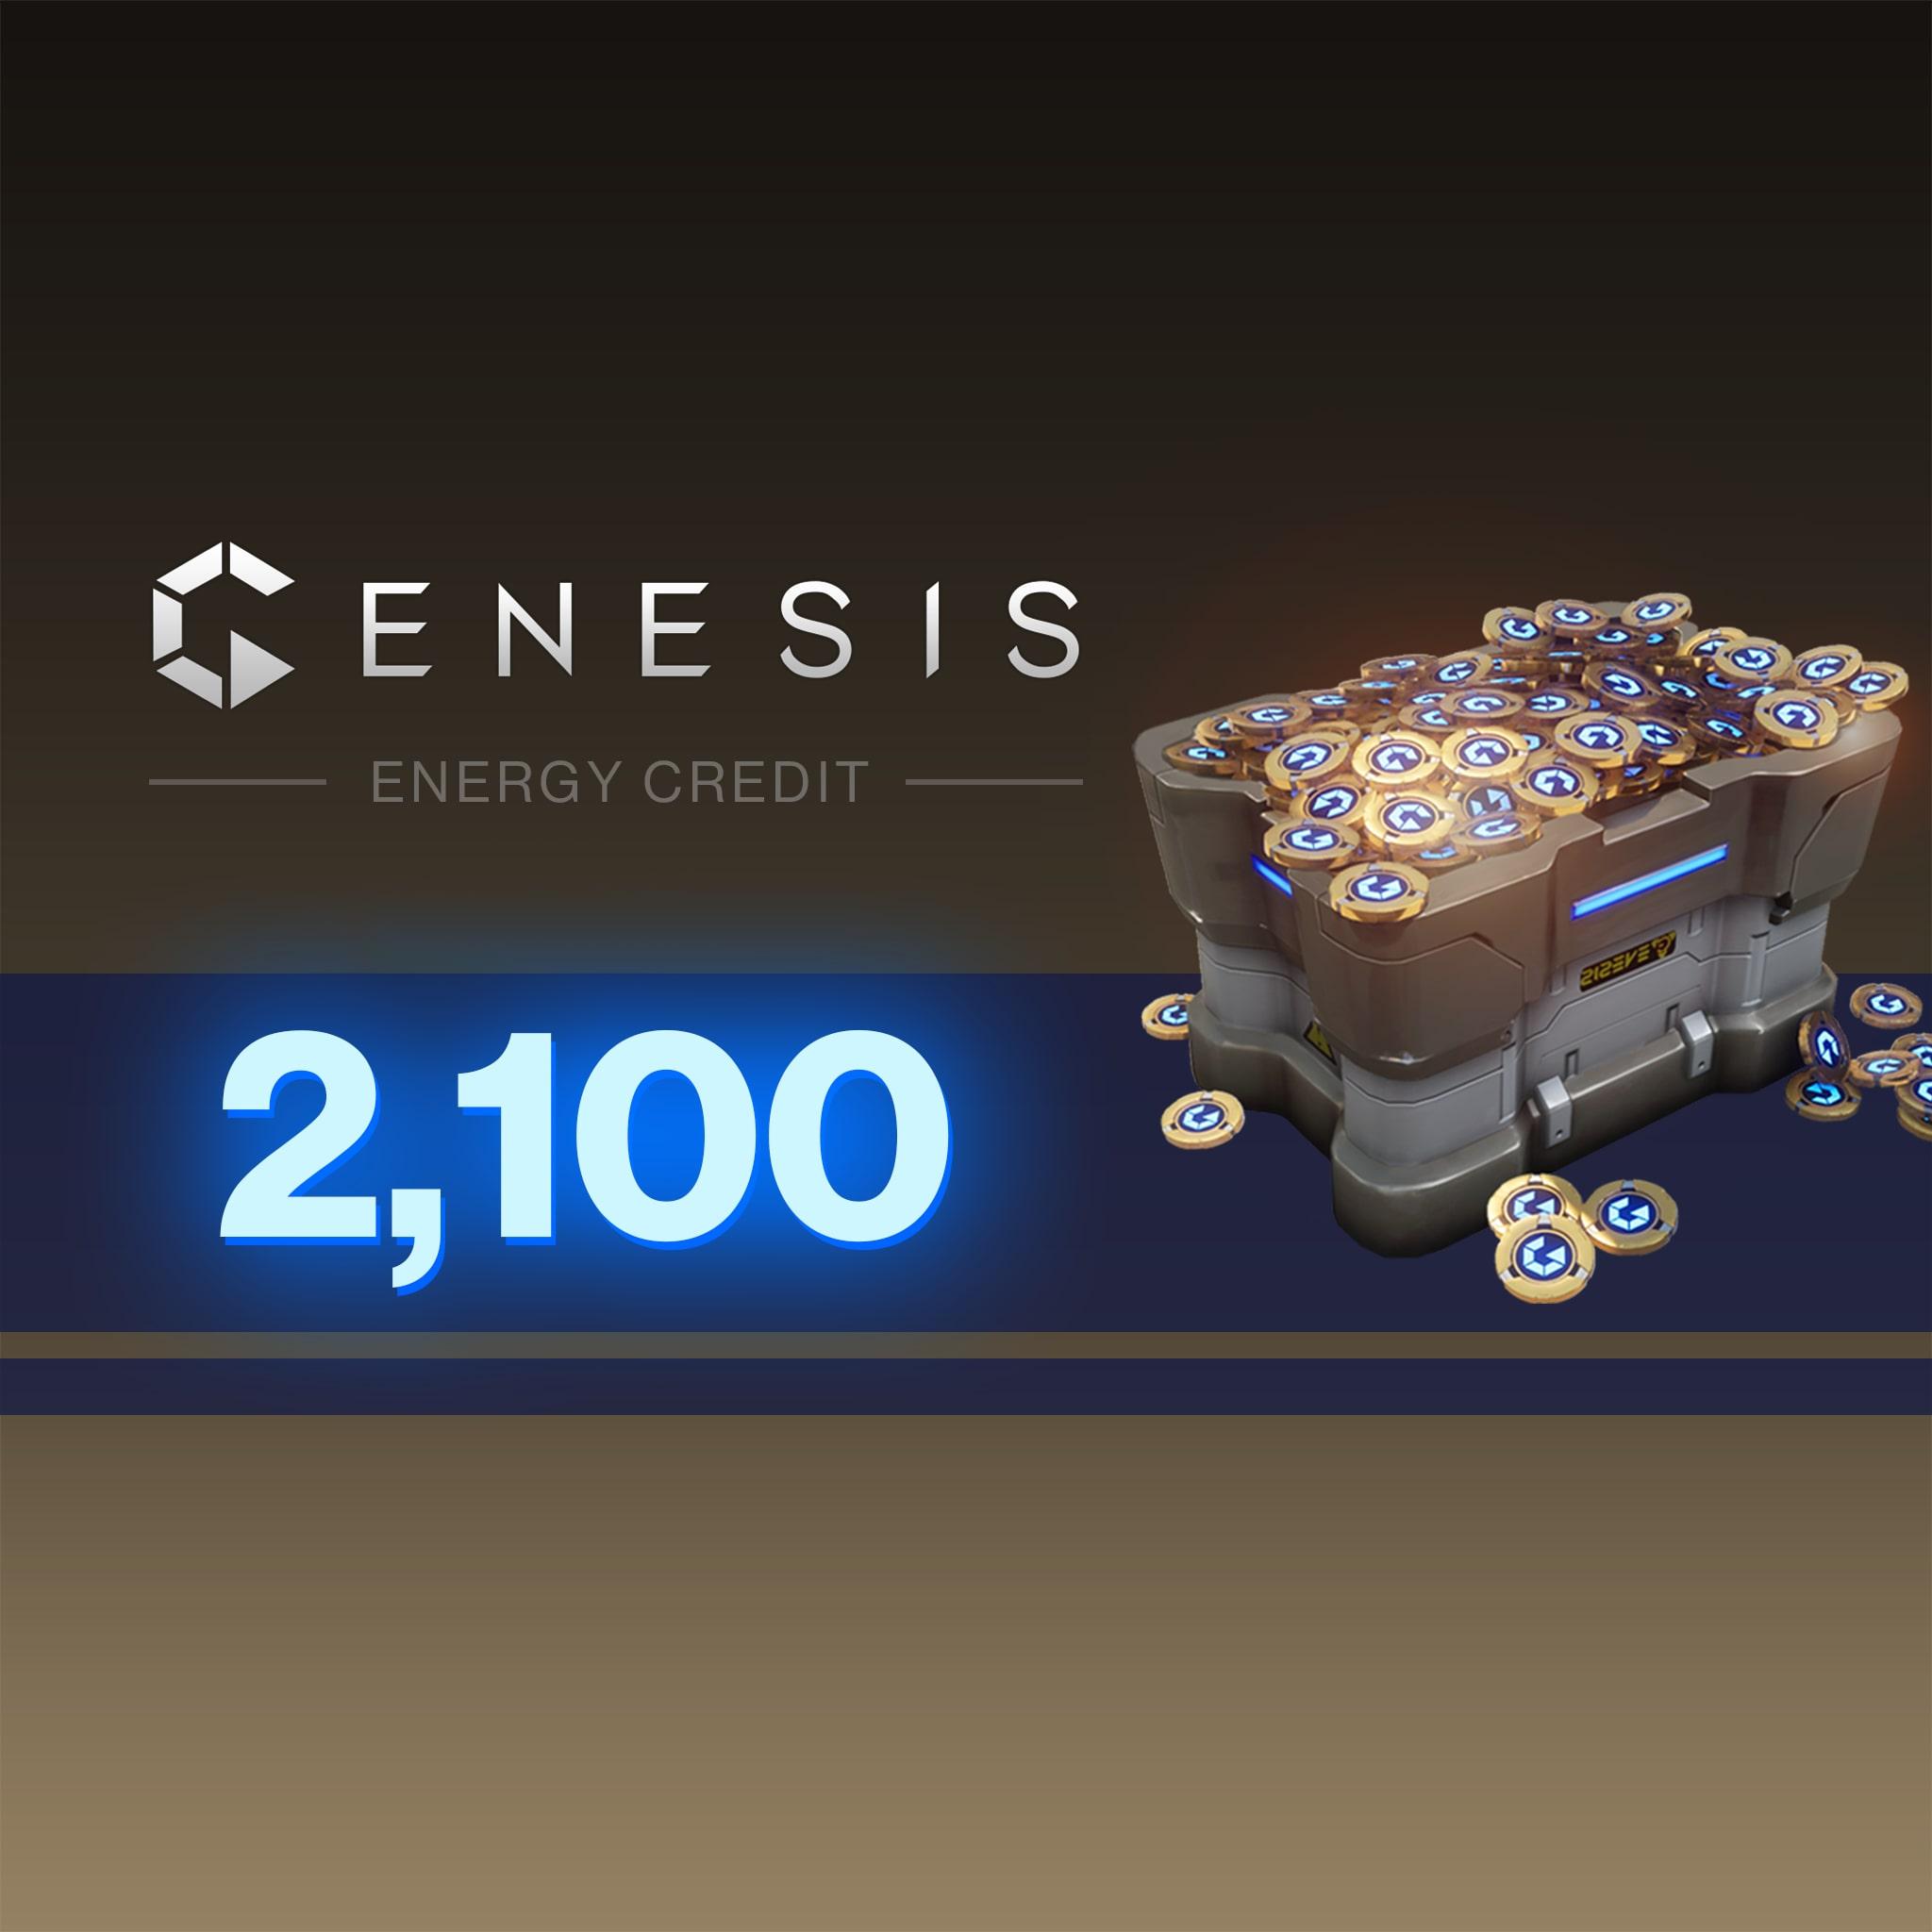 2100 Genesis Energy Credits